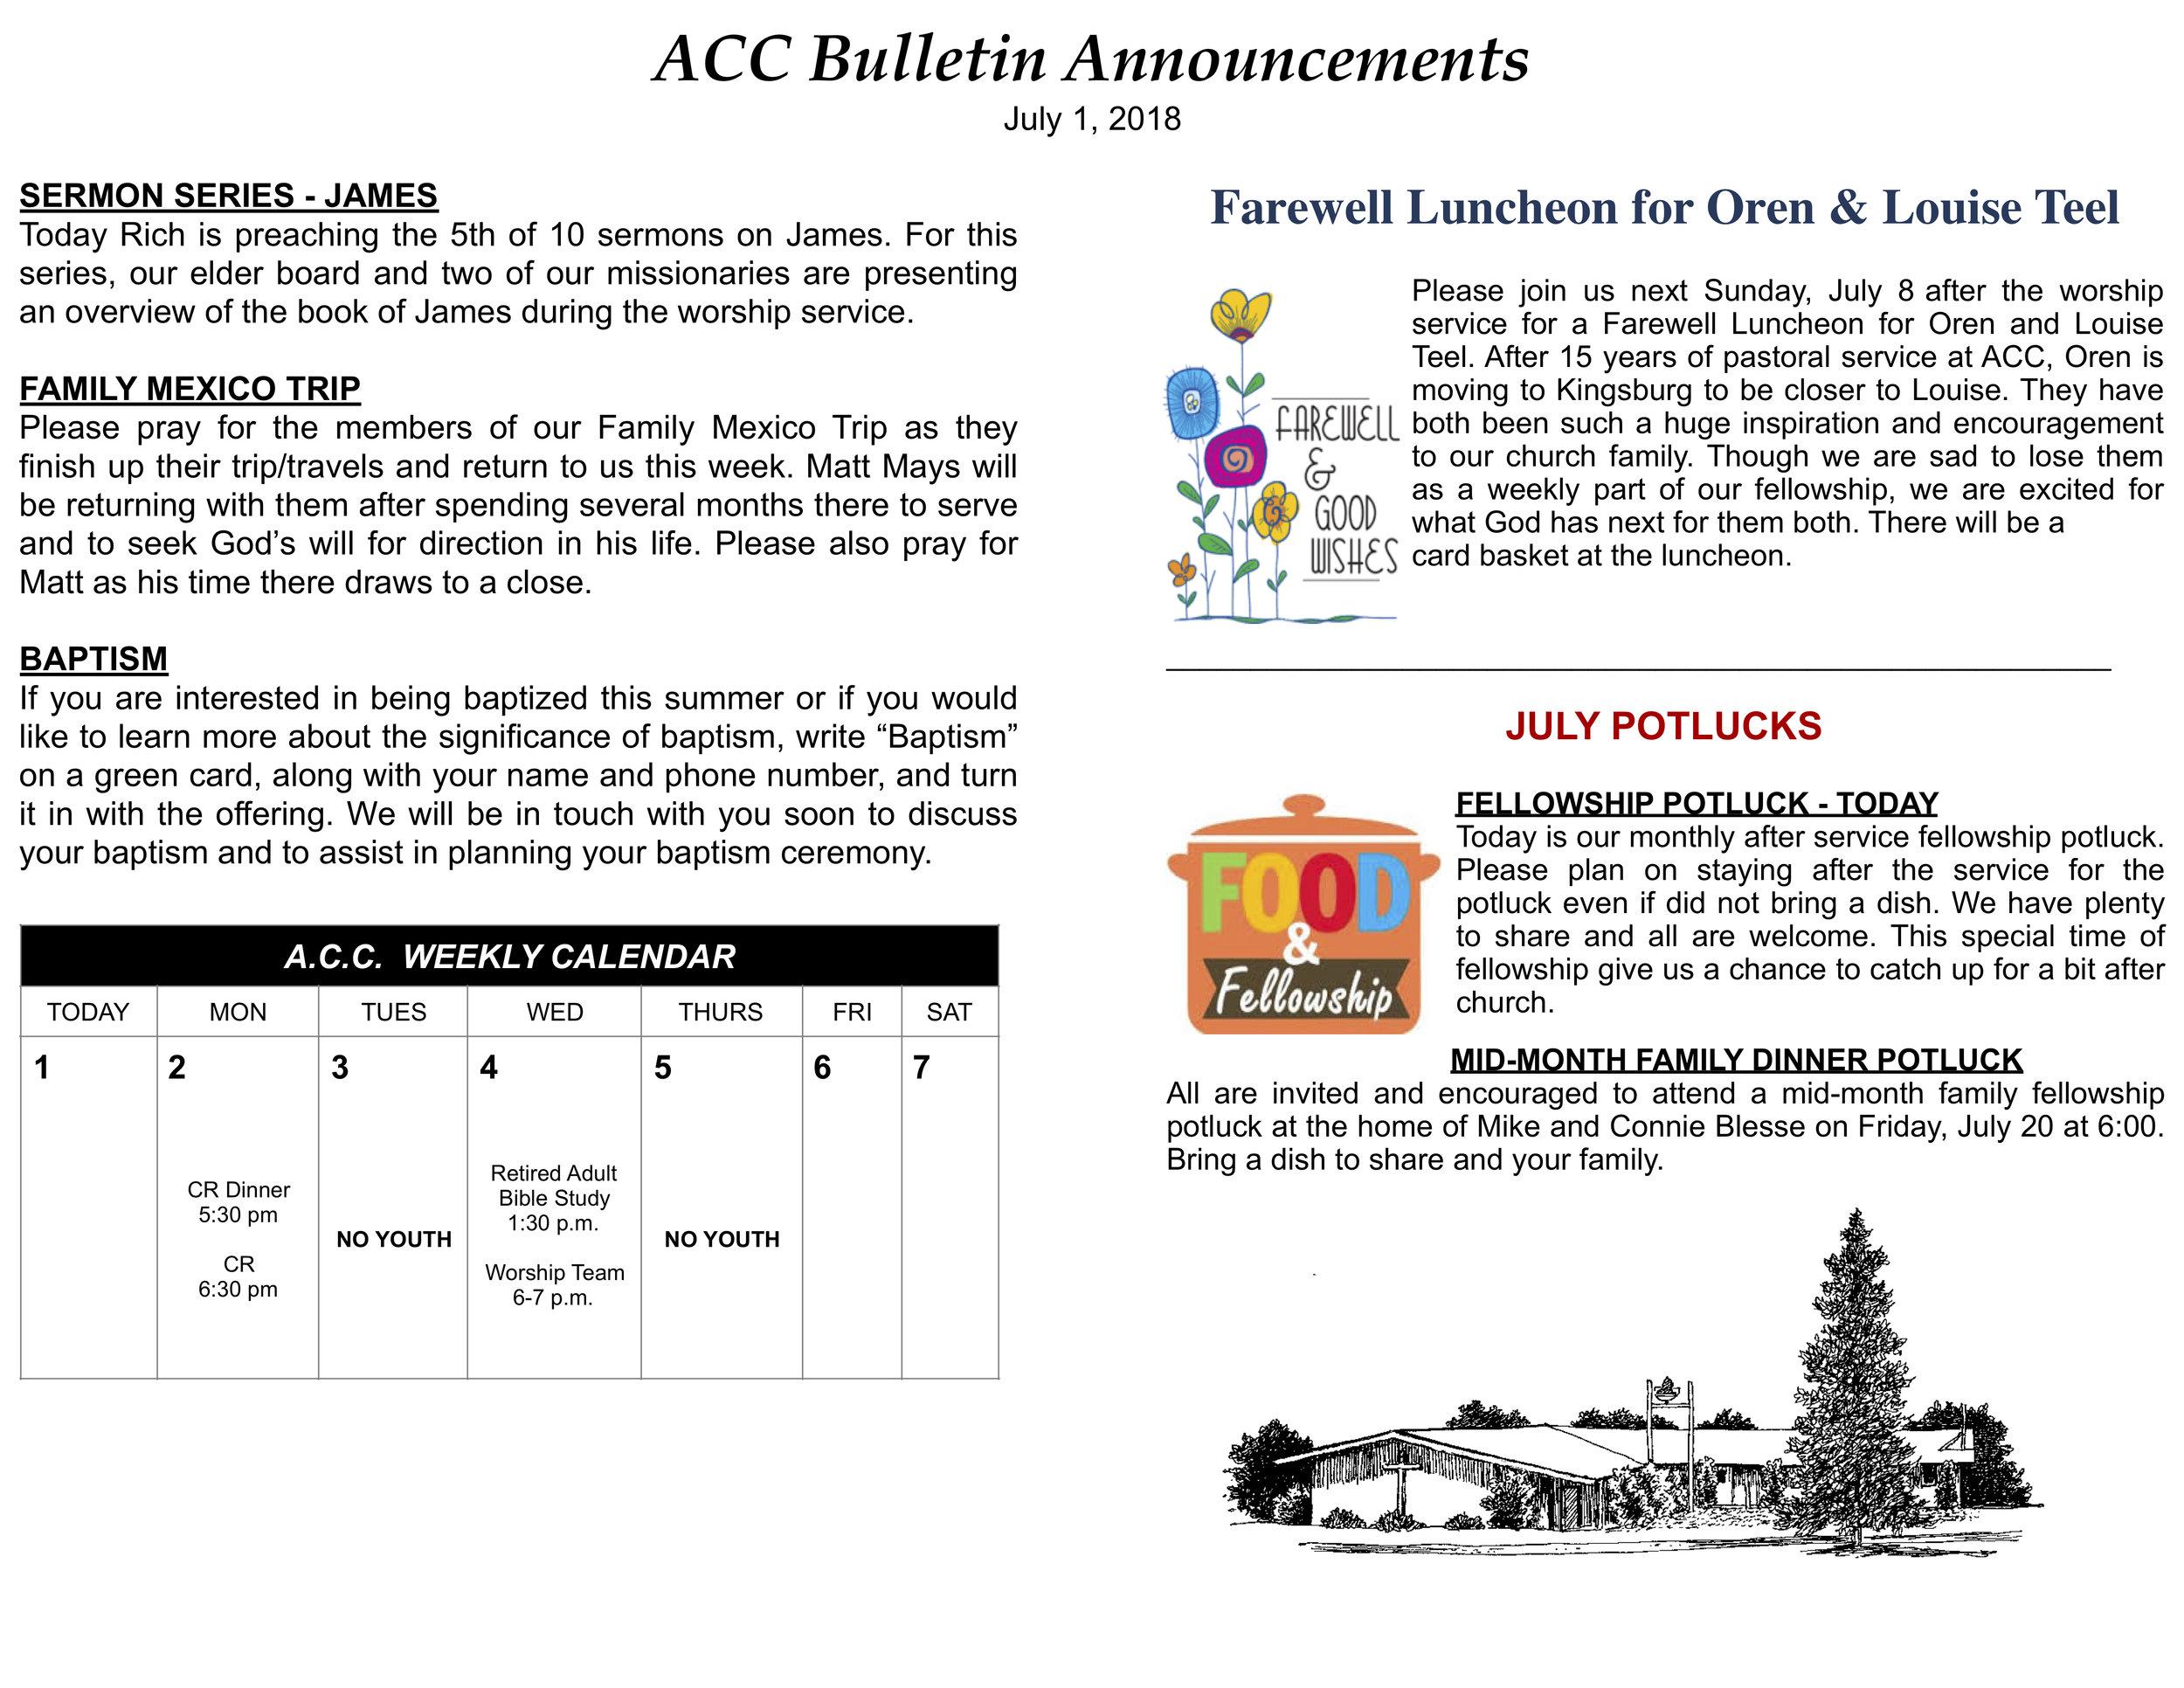 ACCBltn 2018.07.01-1.jpg